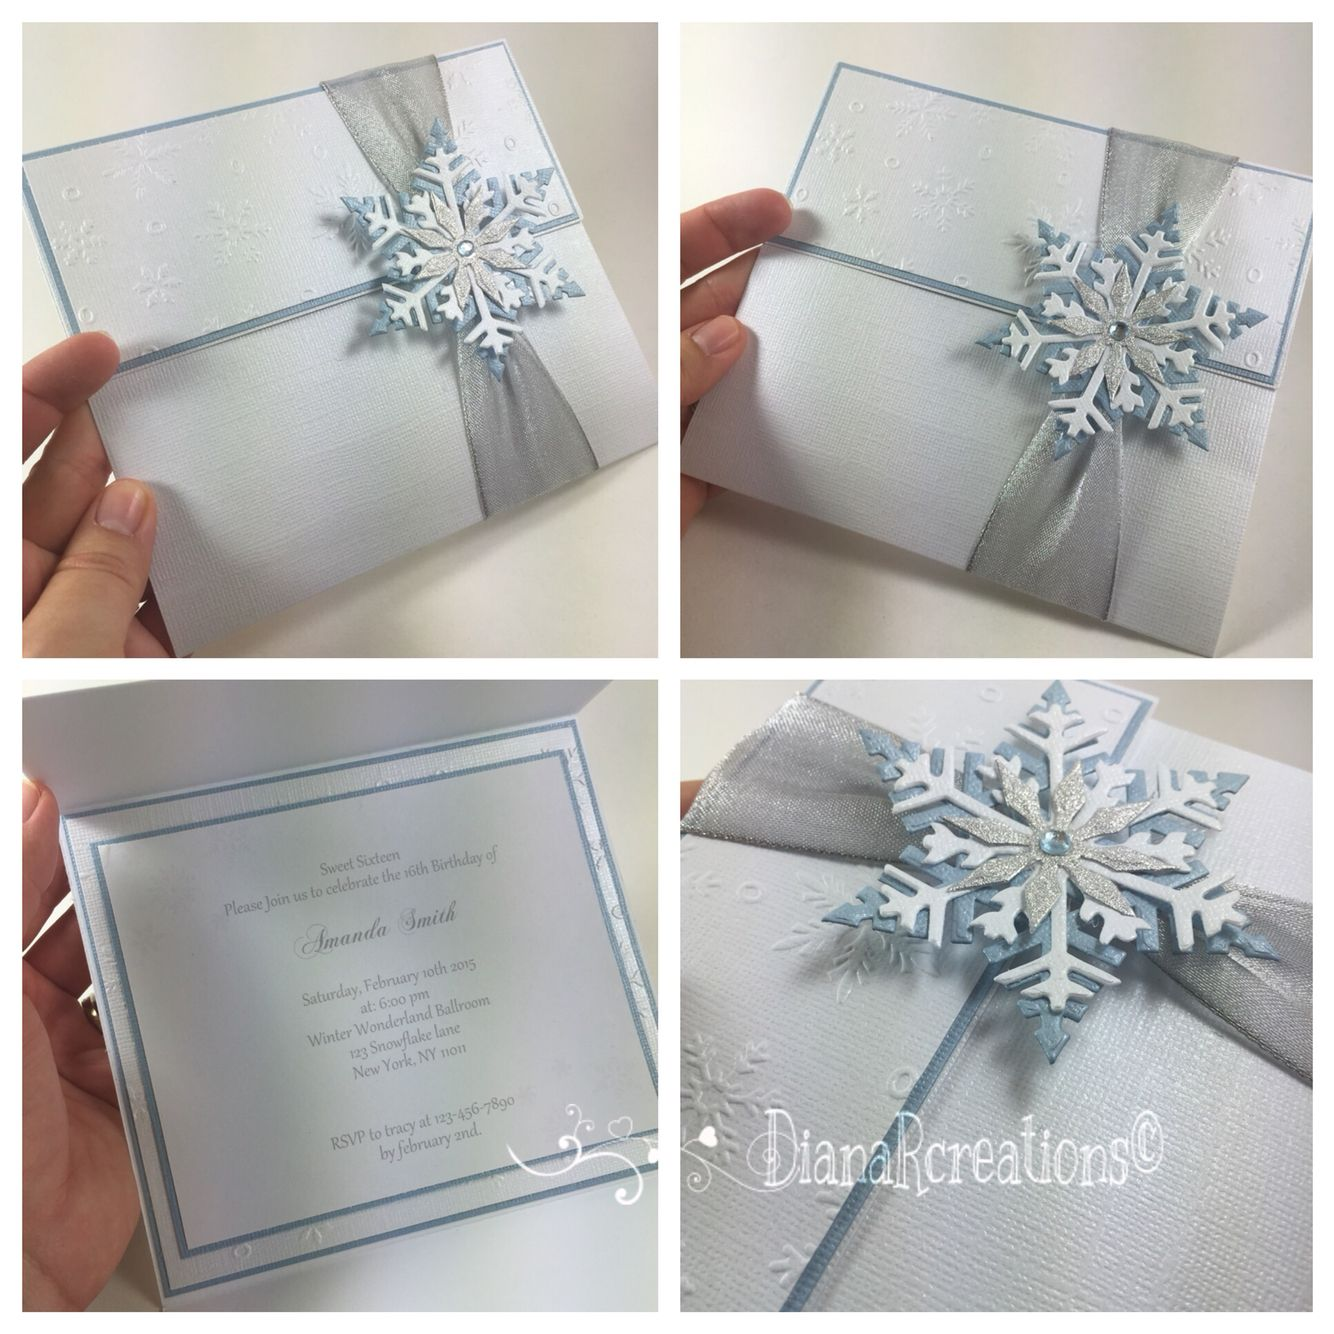 Cute Winter Wonderland Invitations! #dianarcreations #invitations #invites  #invite #handmade #